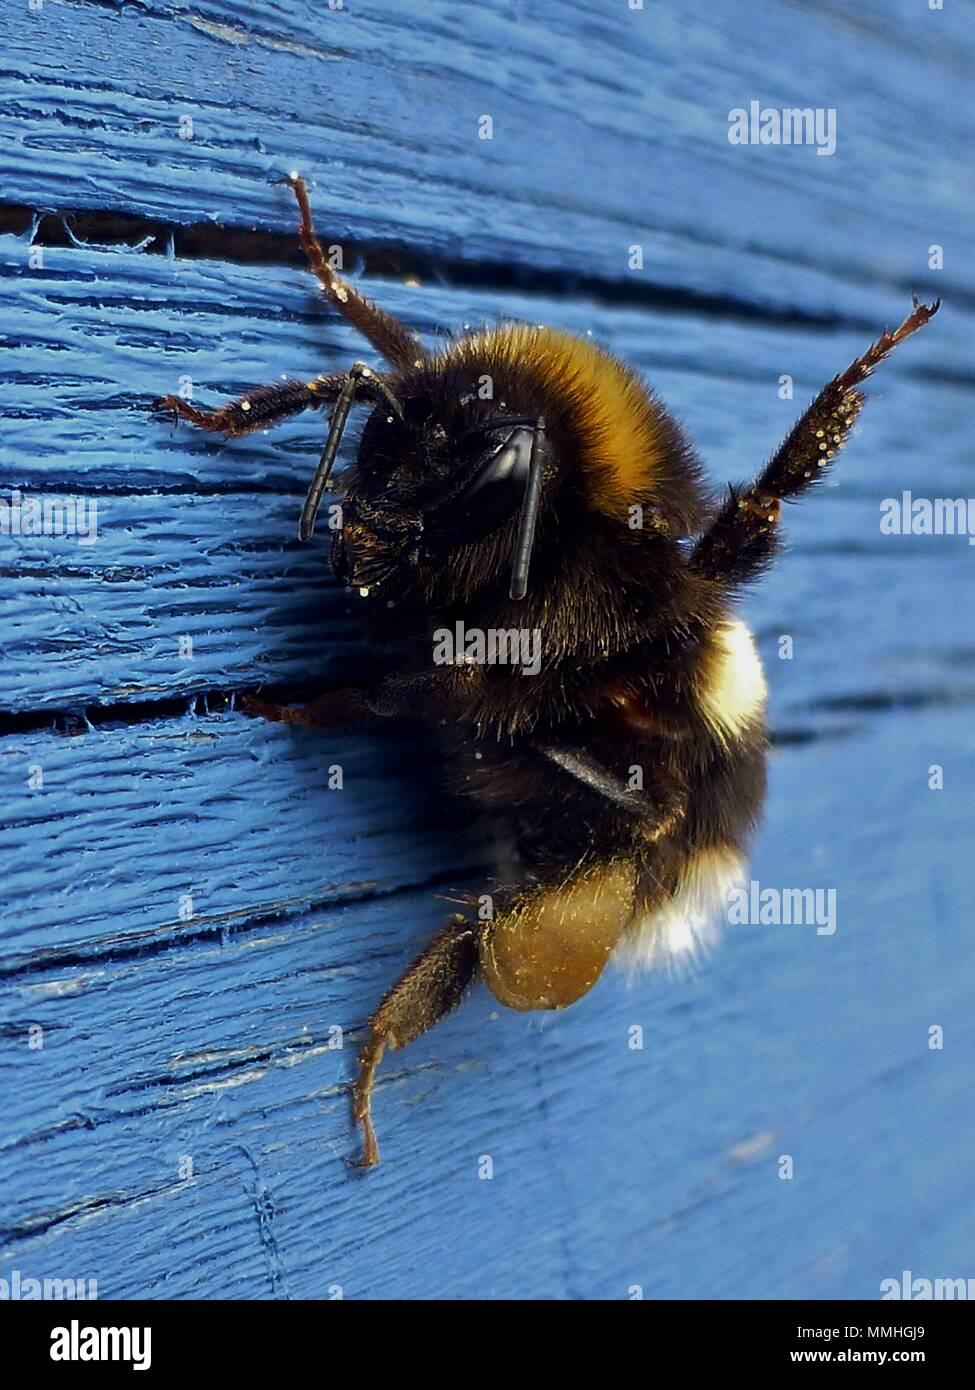 Honey bee - Stock Image